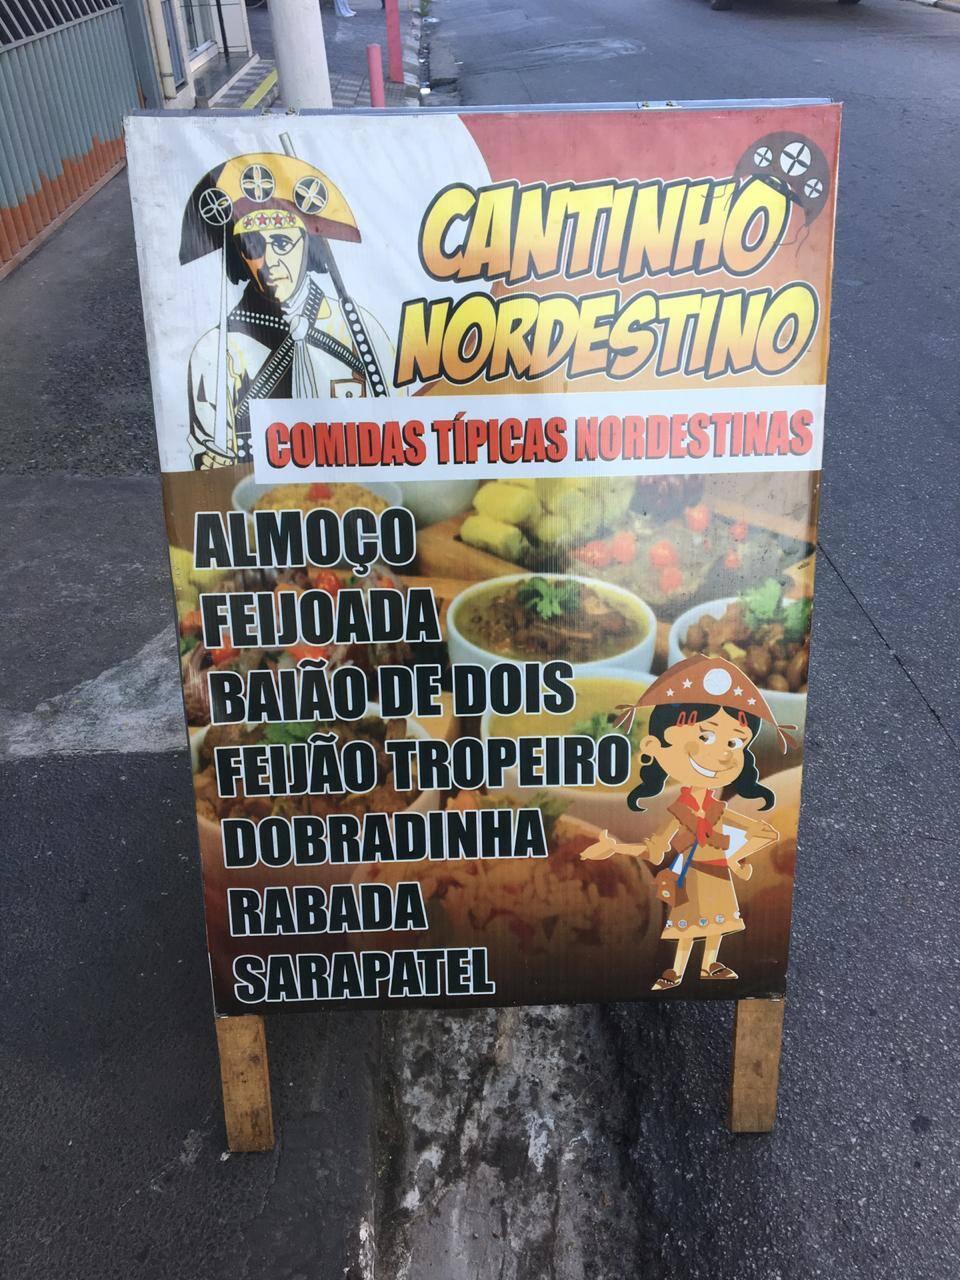 Cantinho Nordestino